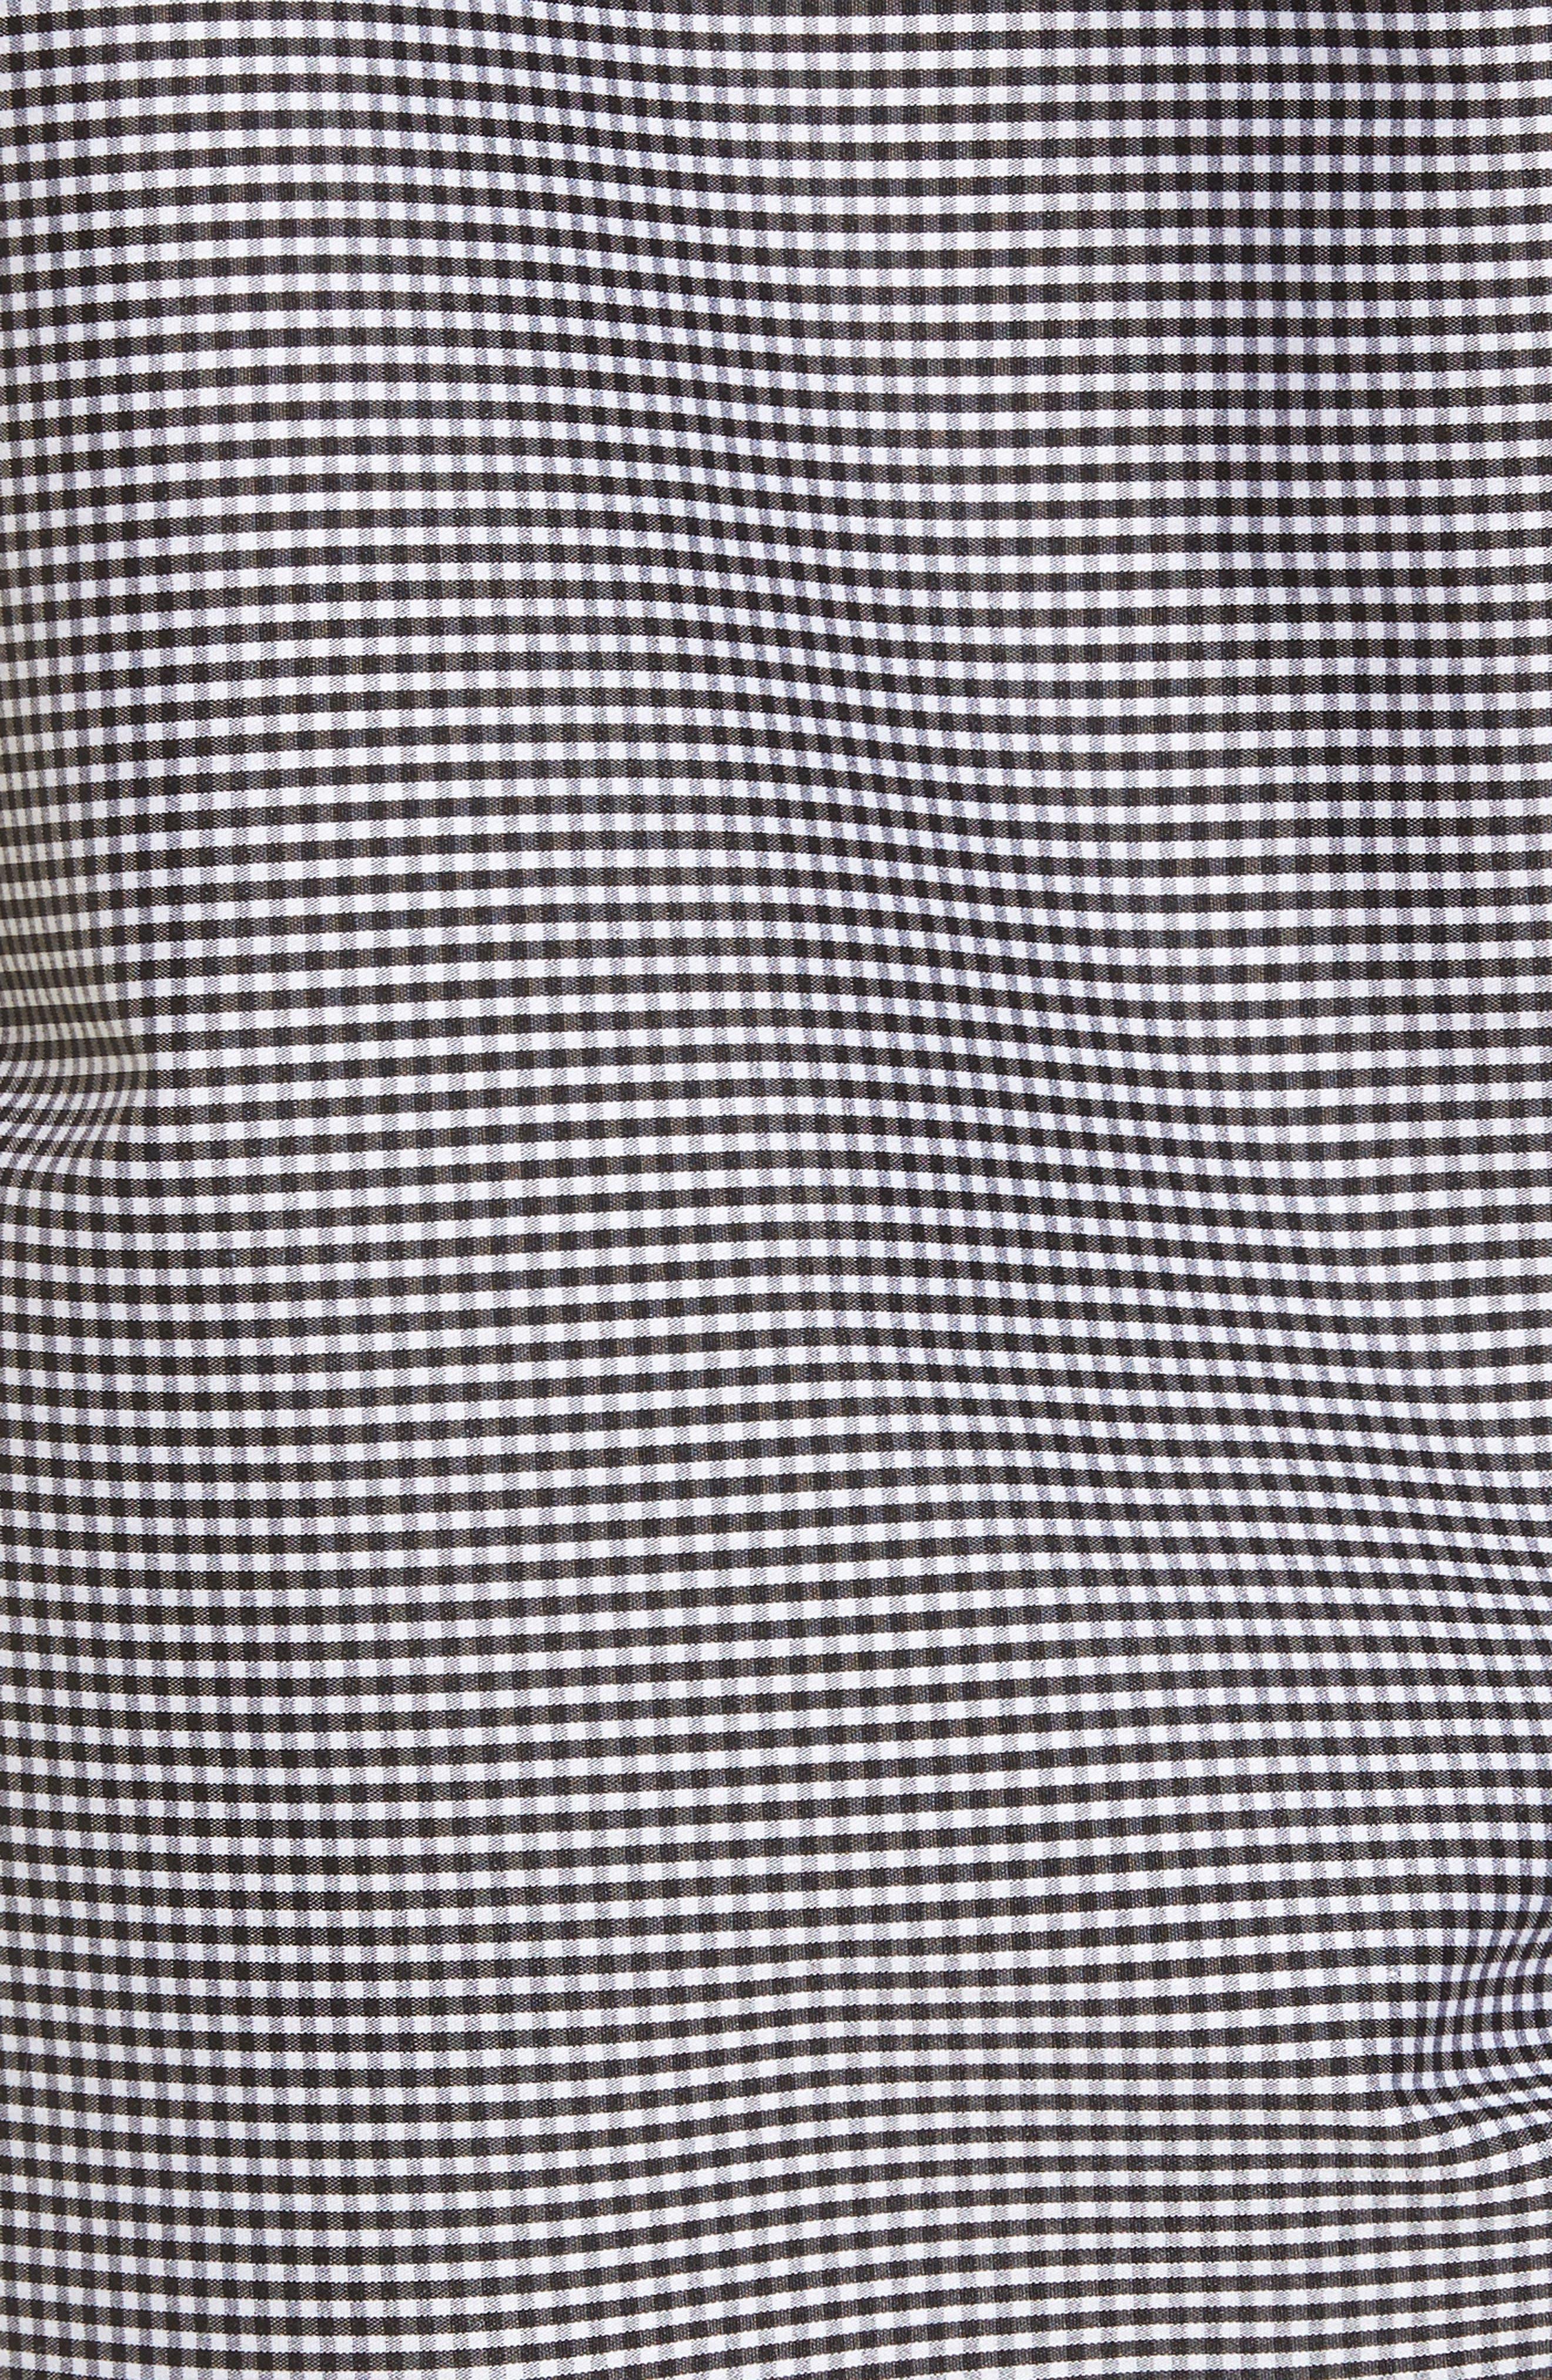 Cutout Ruffle Top,                             Alternate thumbnail 5, color,                             Black- White Mini Gingham